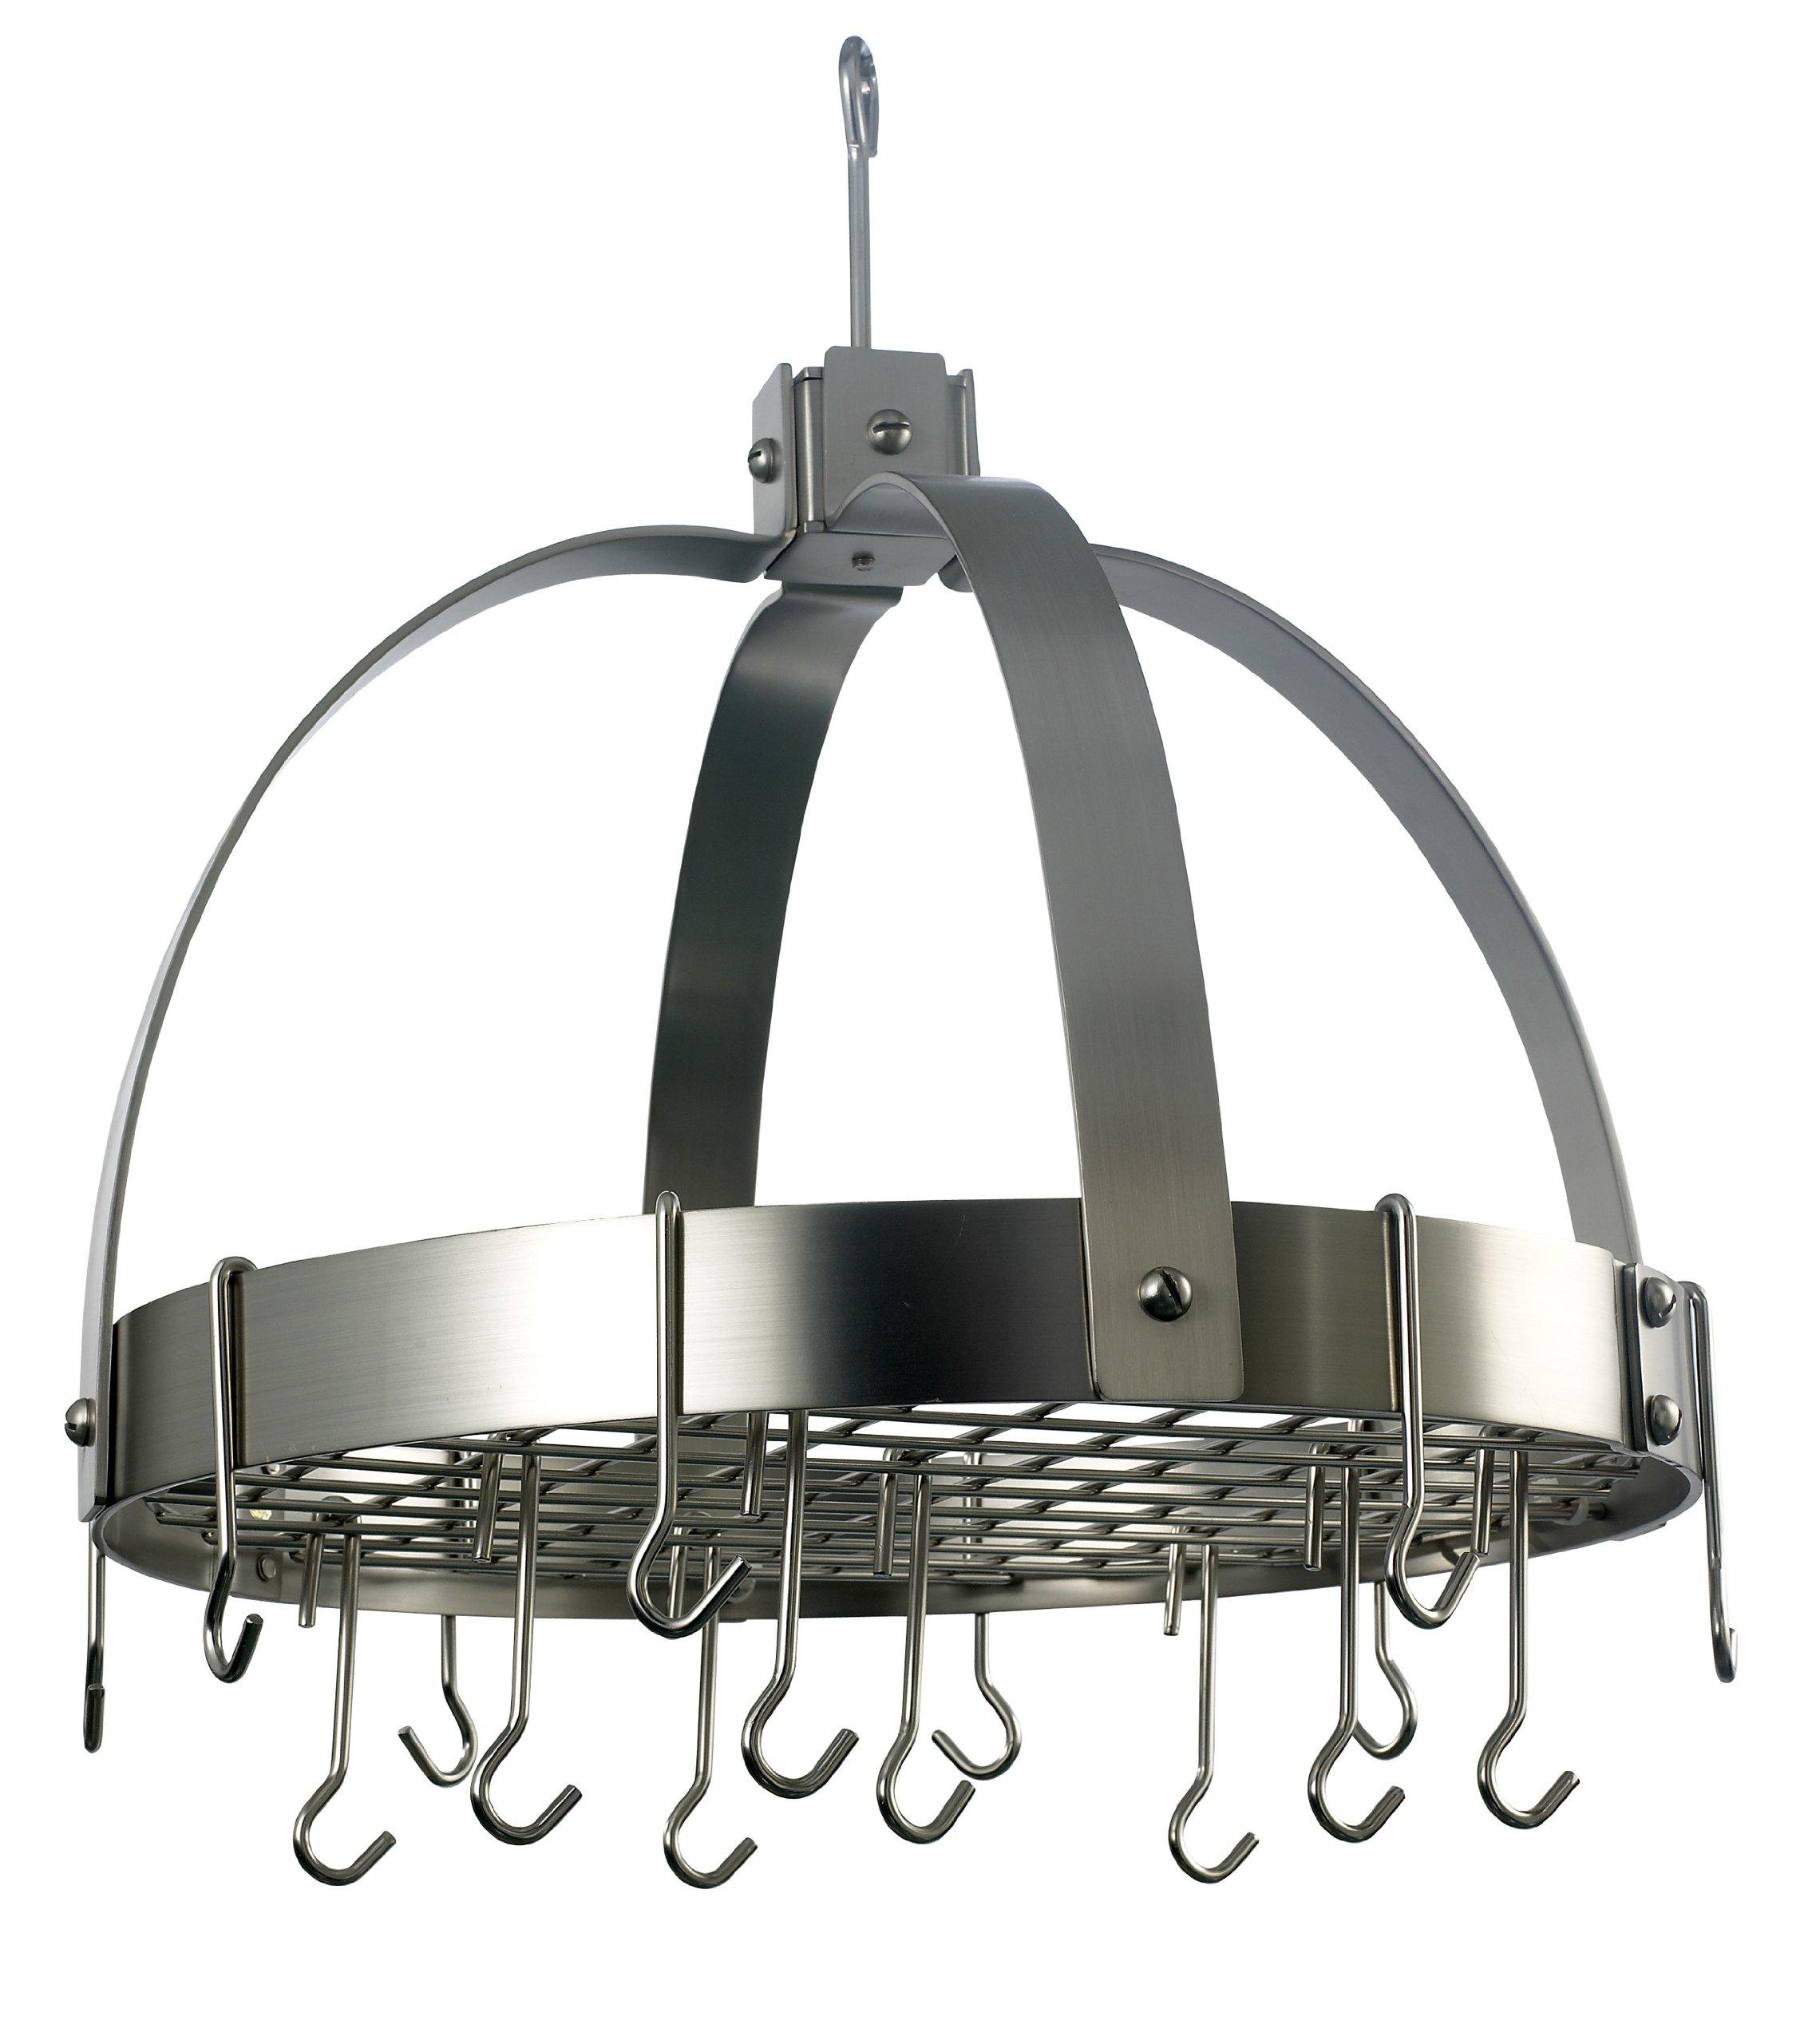 Old Dutch Dome Pot Rack with 16 Hooks, Satin Nickel, 20'' x 15.25'' x 21''